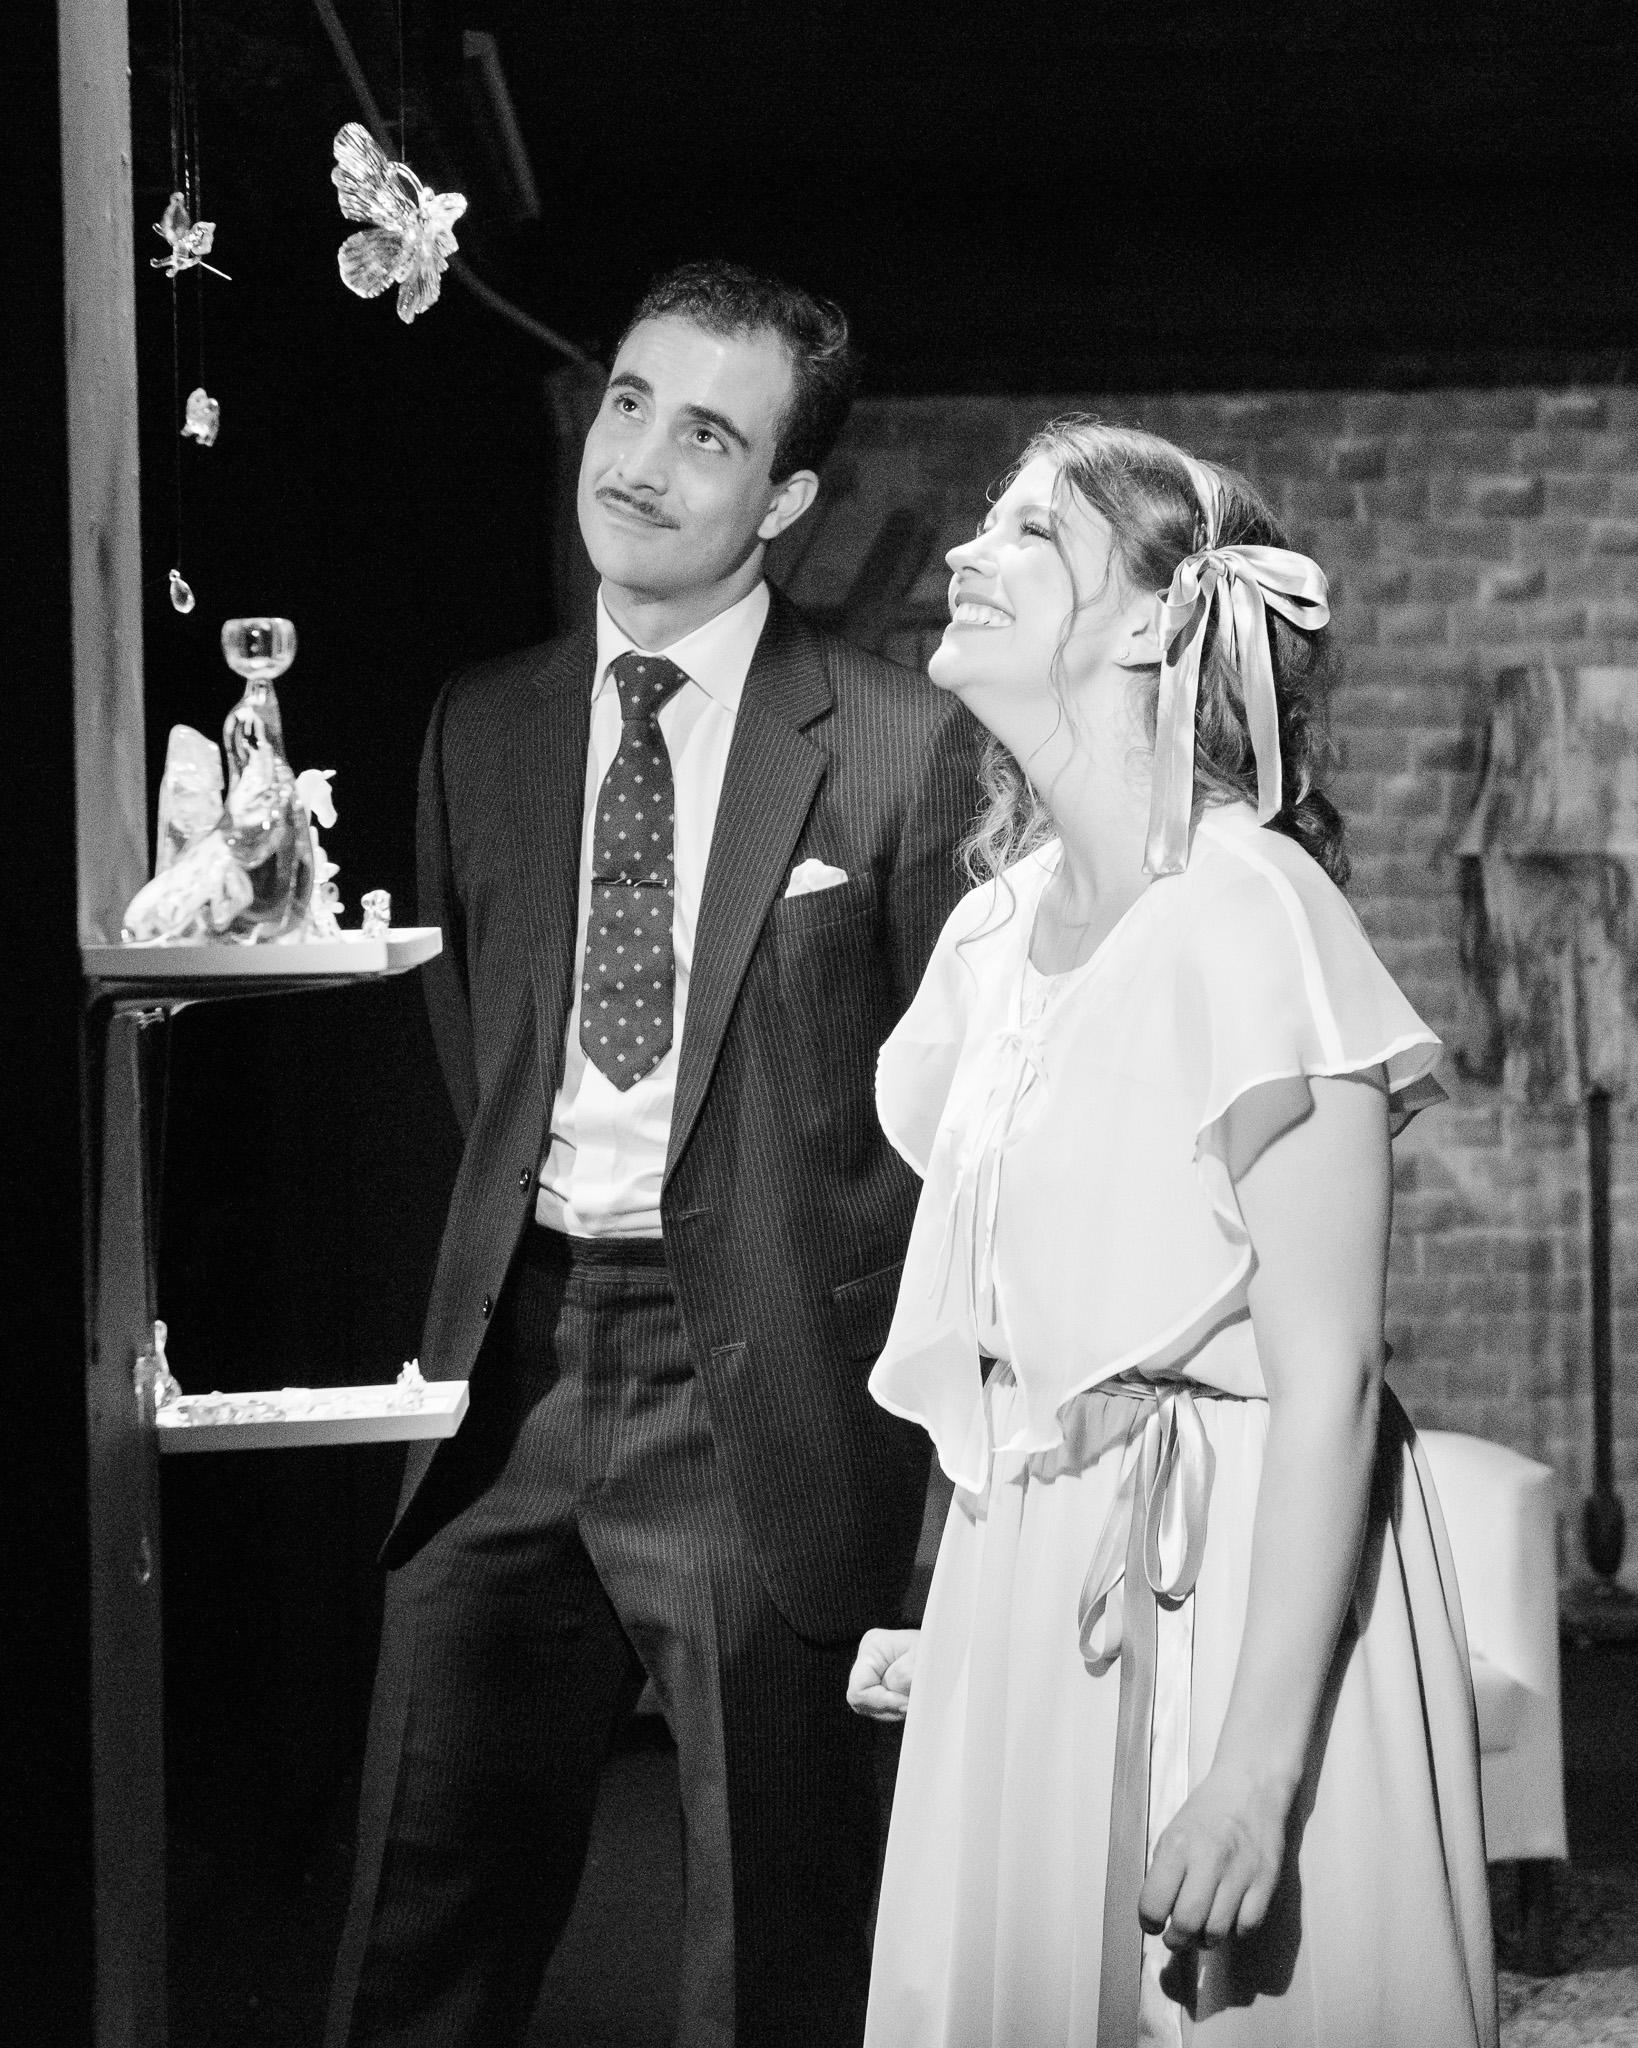 John Shubat as Jim and Claire MacMaster as Laura. Photo by John Ordean